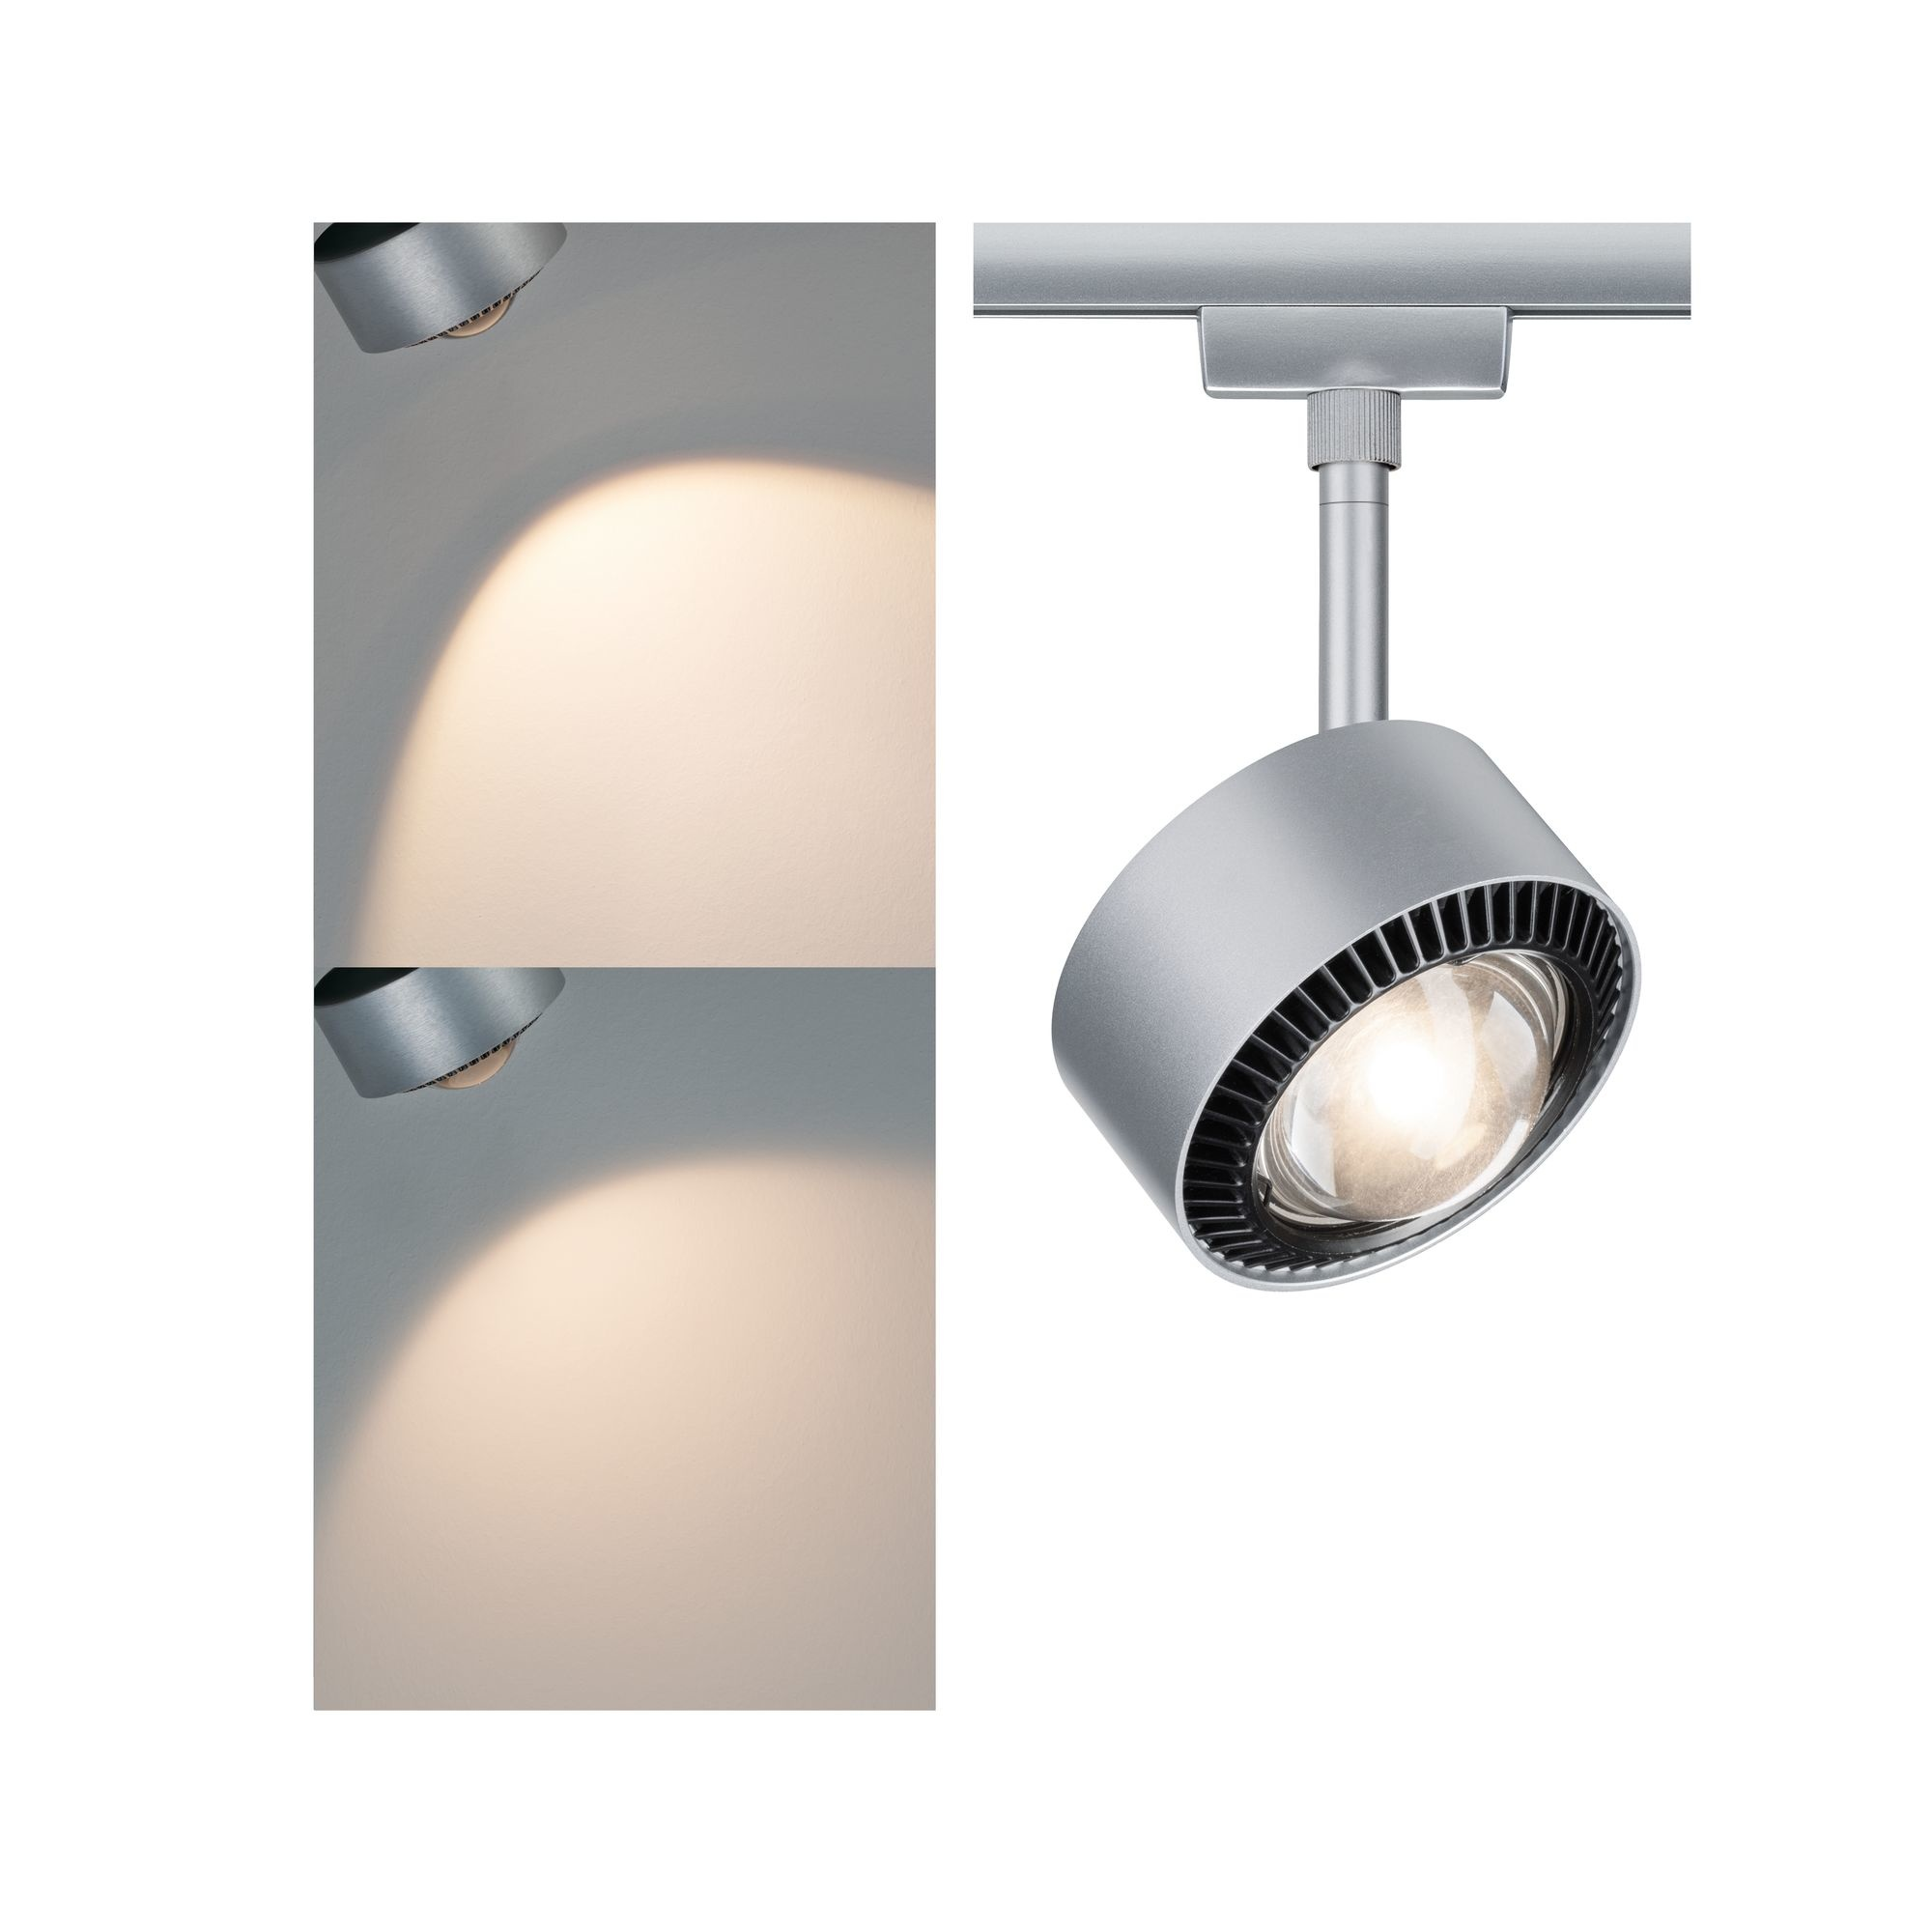 Paulmann URail Spot Aldan 1x9W Chrom matt/Schwarz230V Metall/ Kunststoff dimmbar